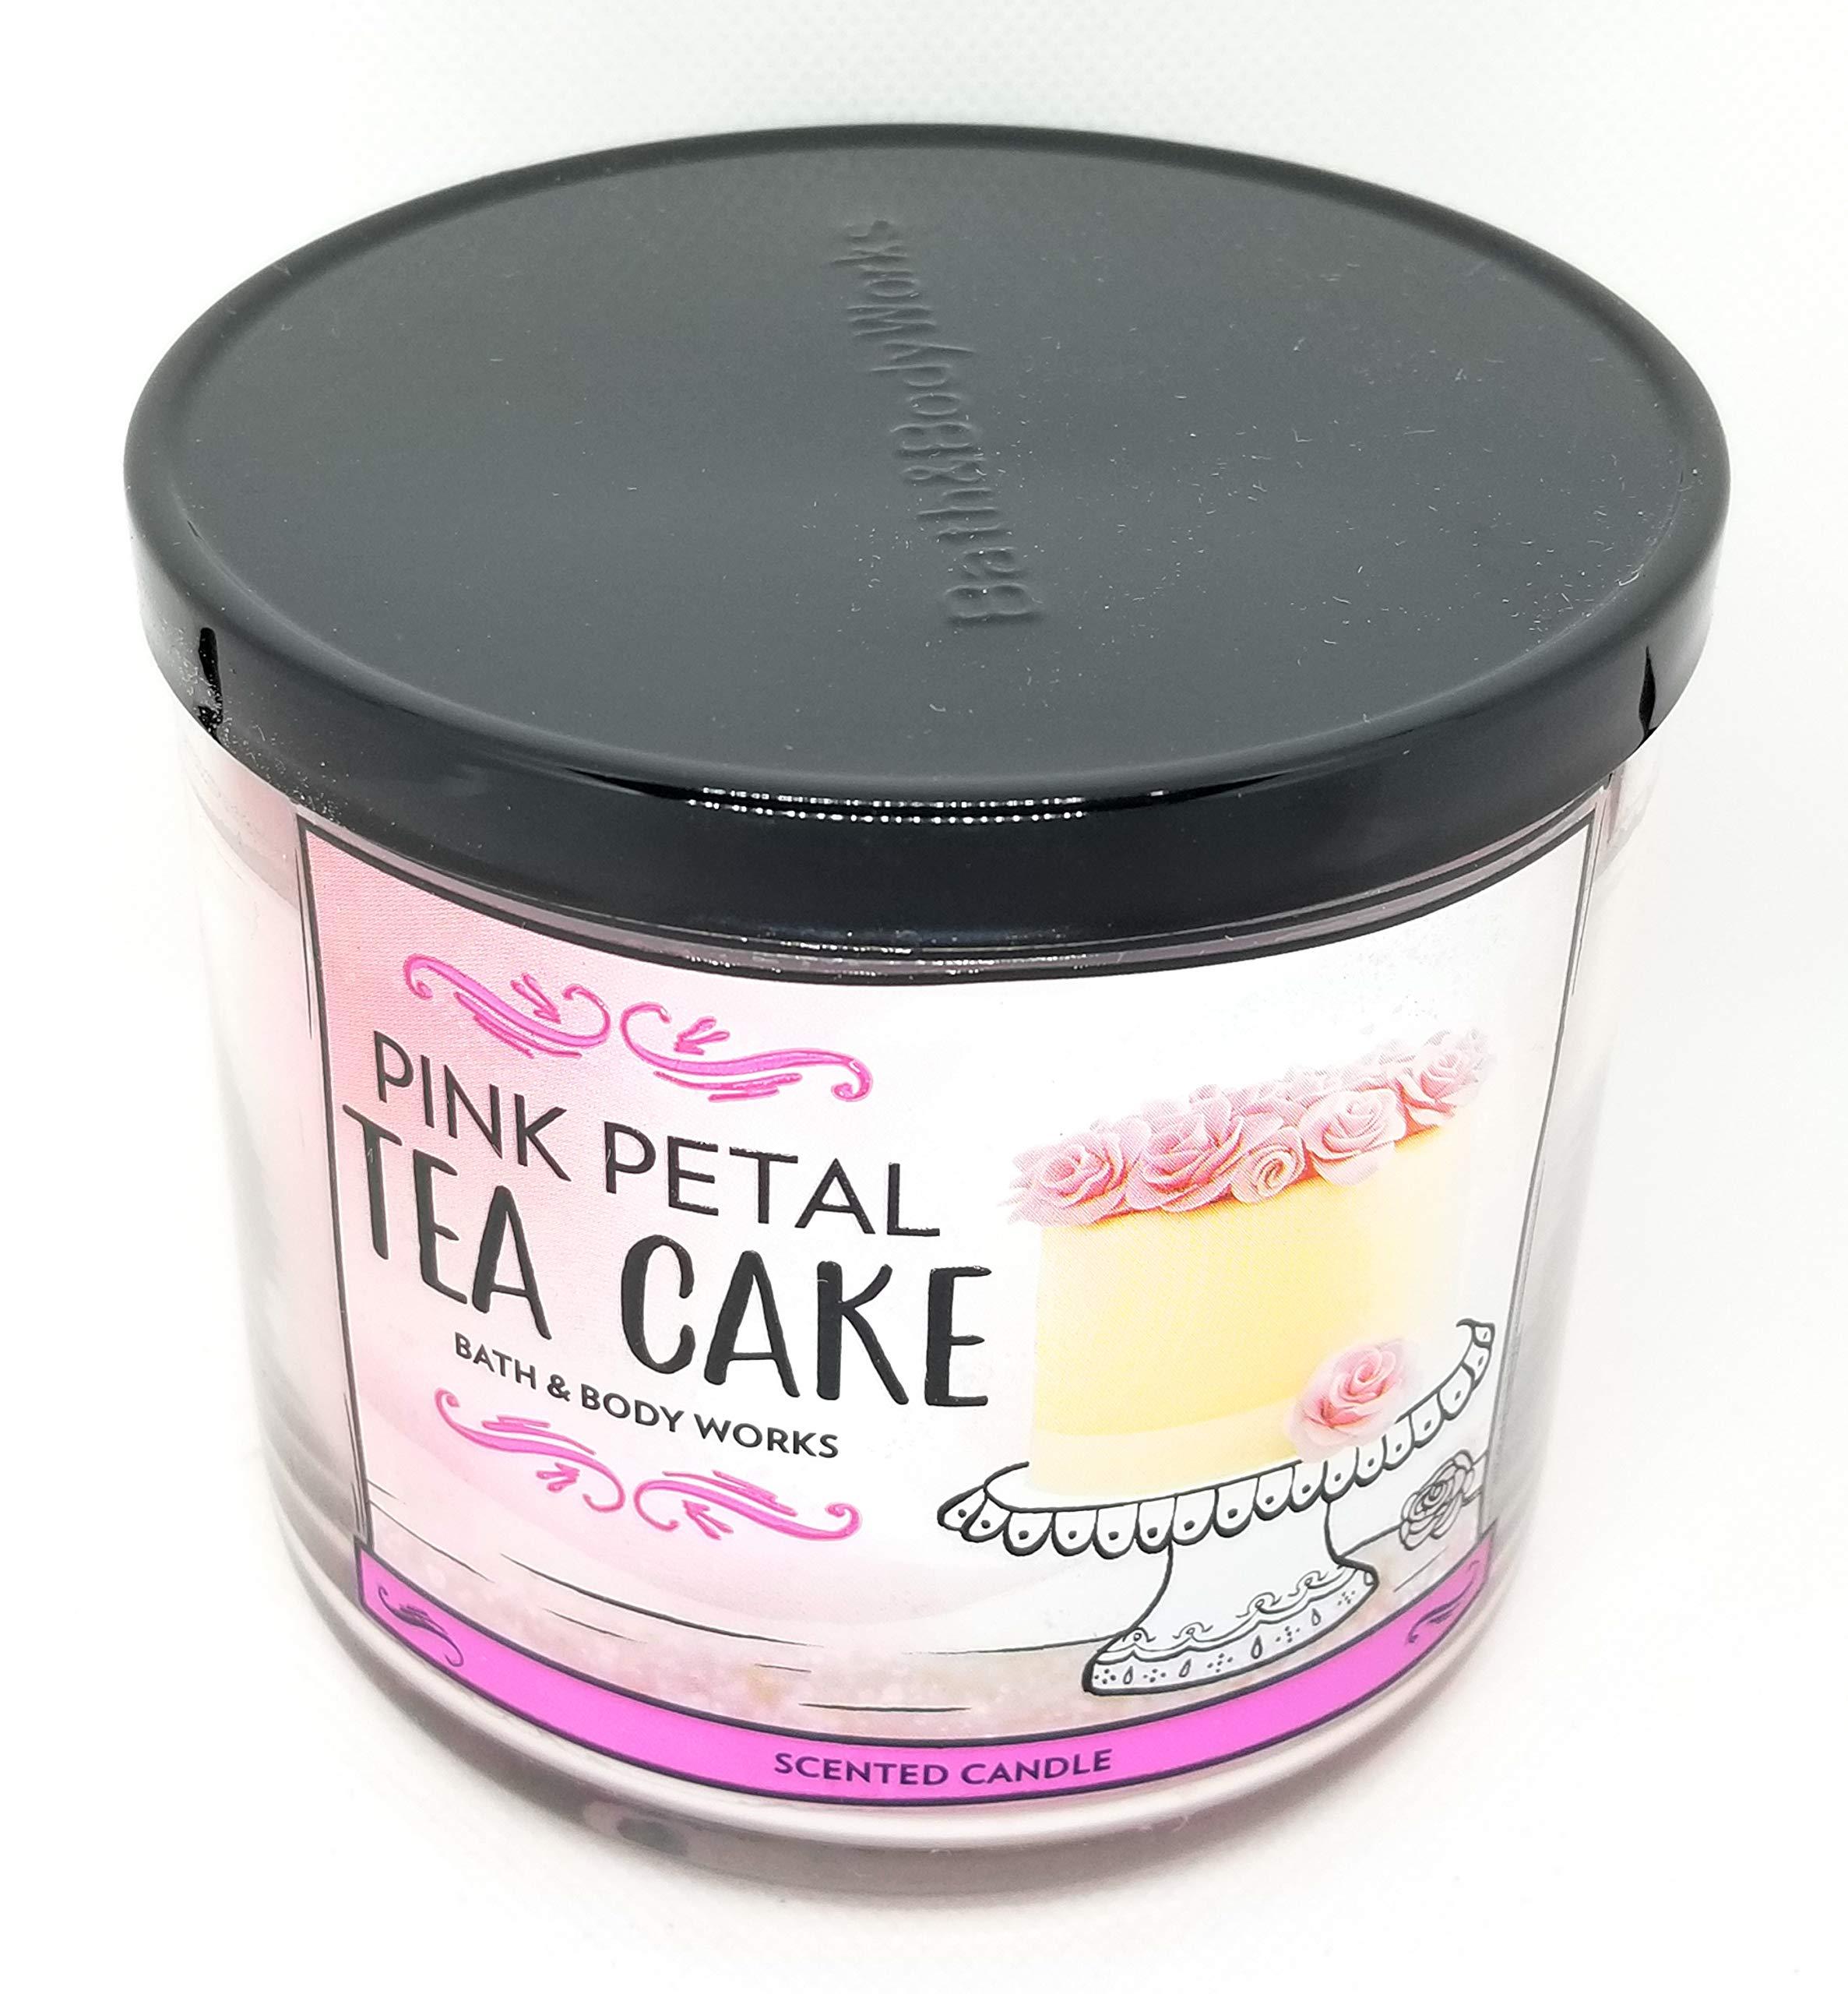 amazon.com - Bath and Body Works White Barn Pink Petal Tea Cake 3 Wick Candle 14.5 Ounce